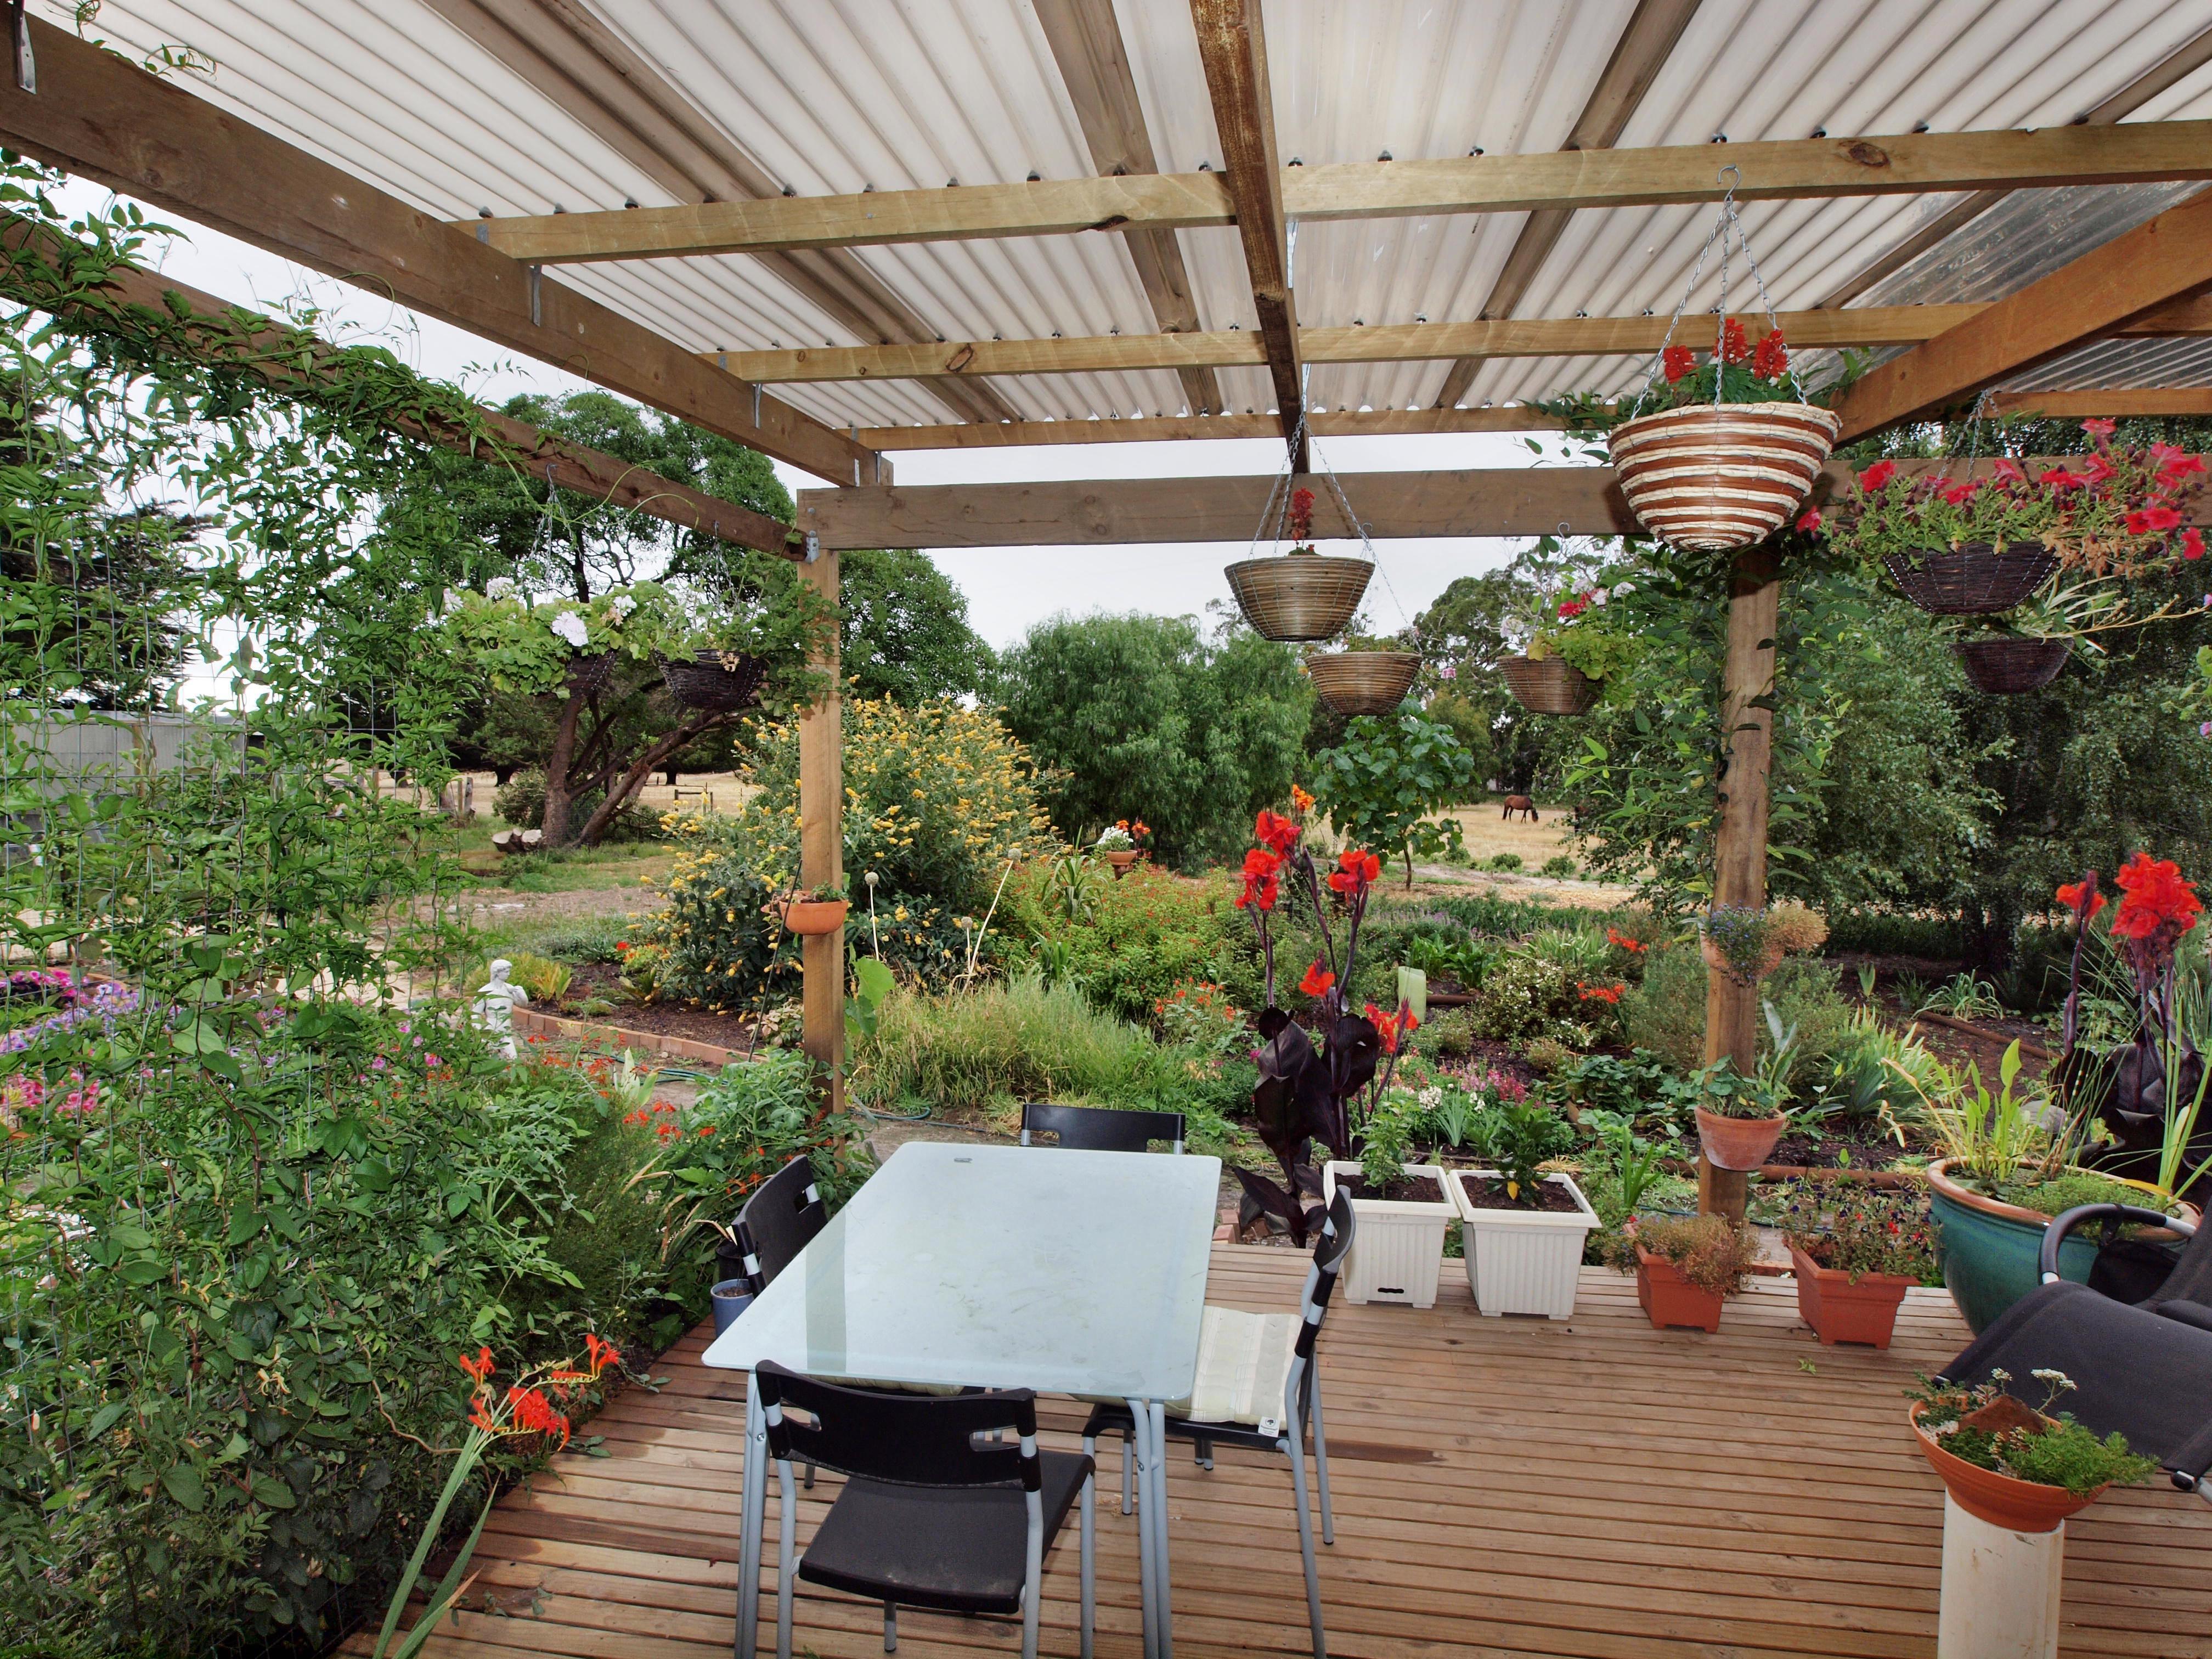 verandah-3-10mm.jpeg